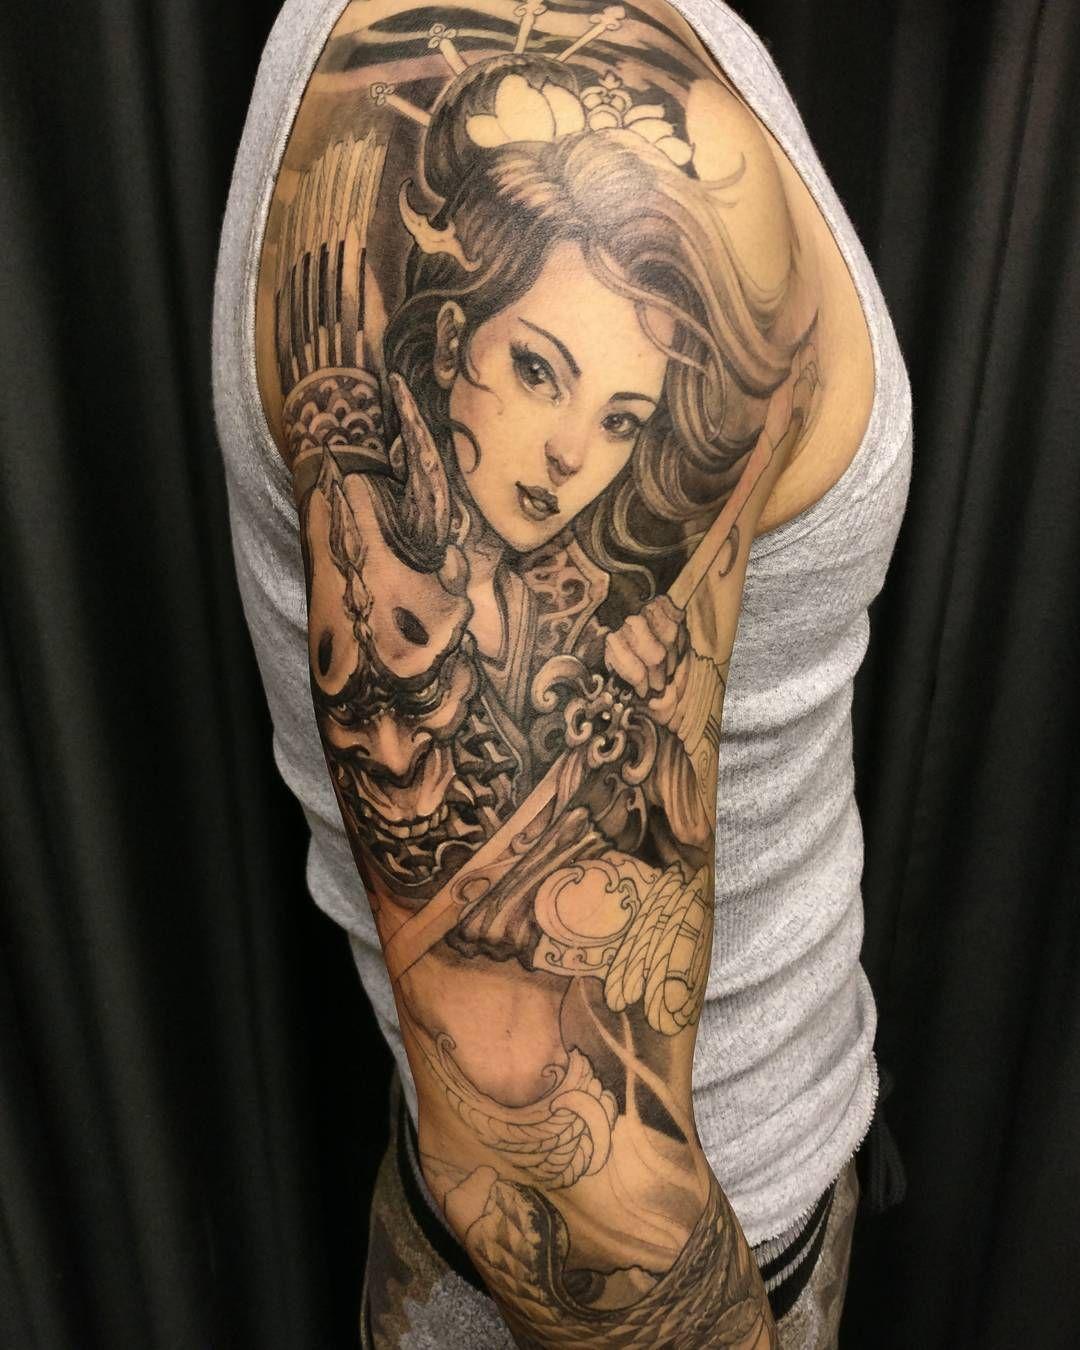 David Hoang On Instagram Back To Back Tiger Tattoo: More Progress On Evan's Geisha Warrior Sleeve. #chronicink